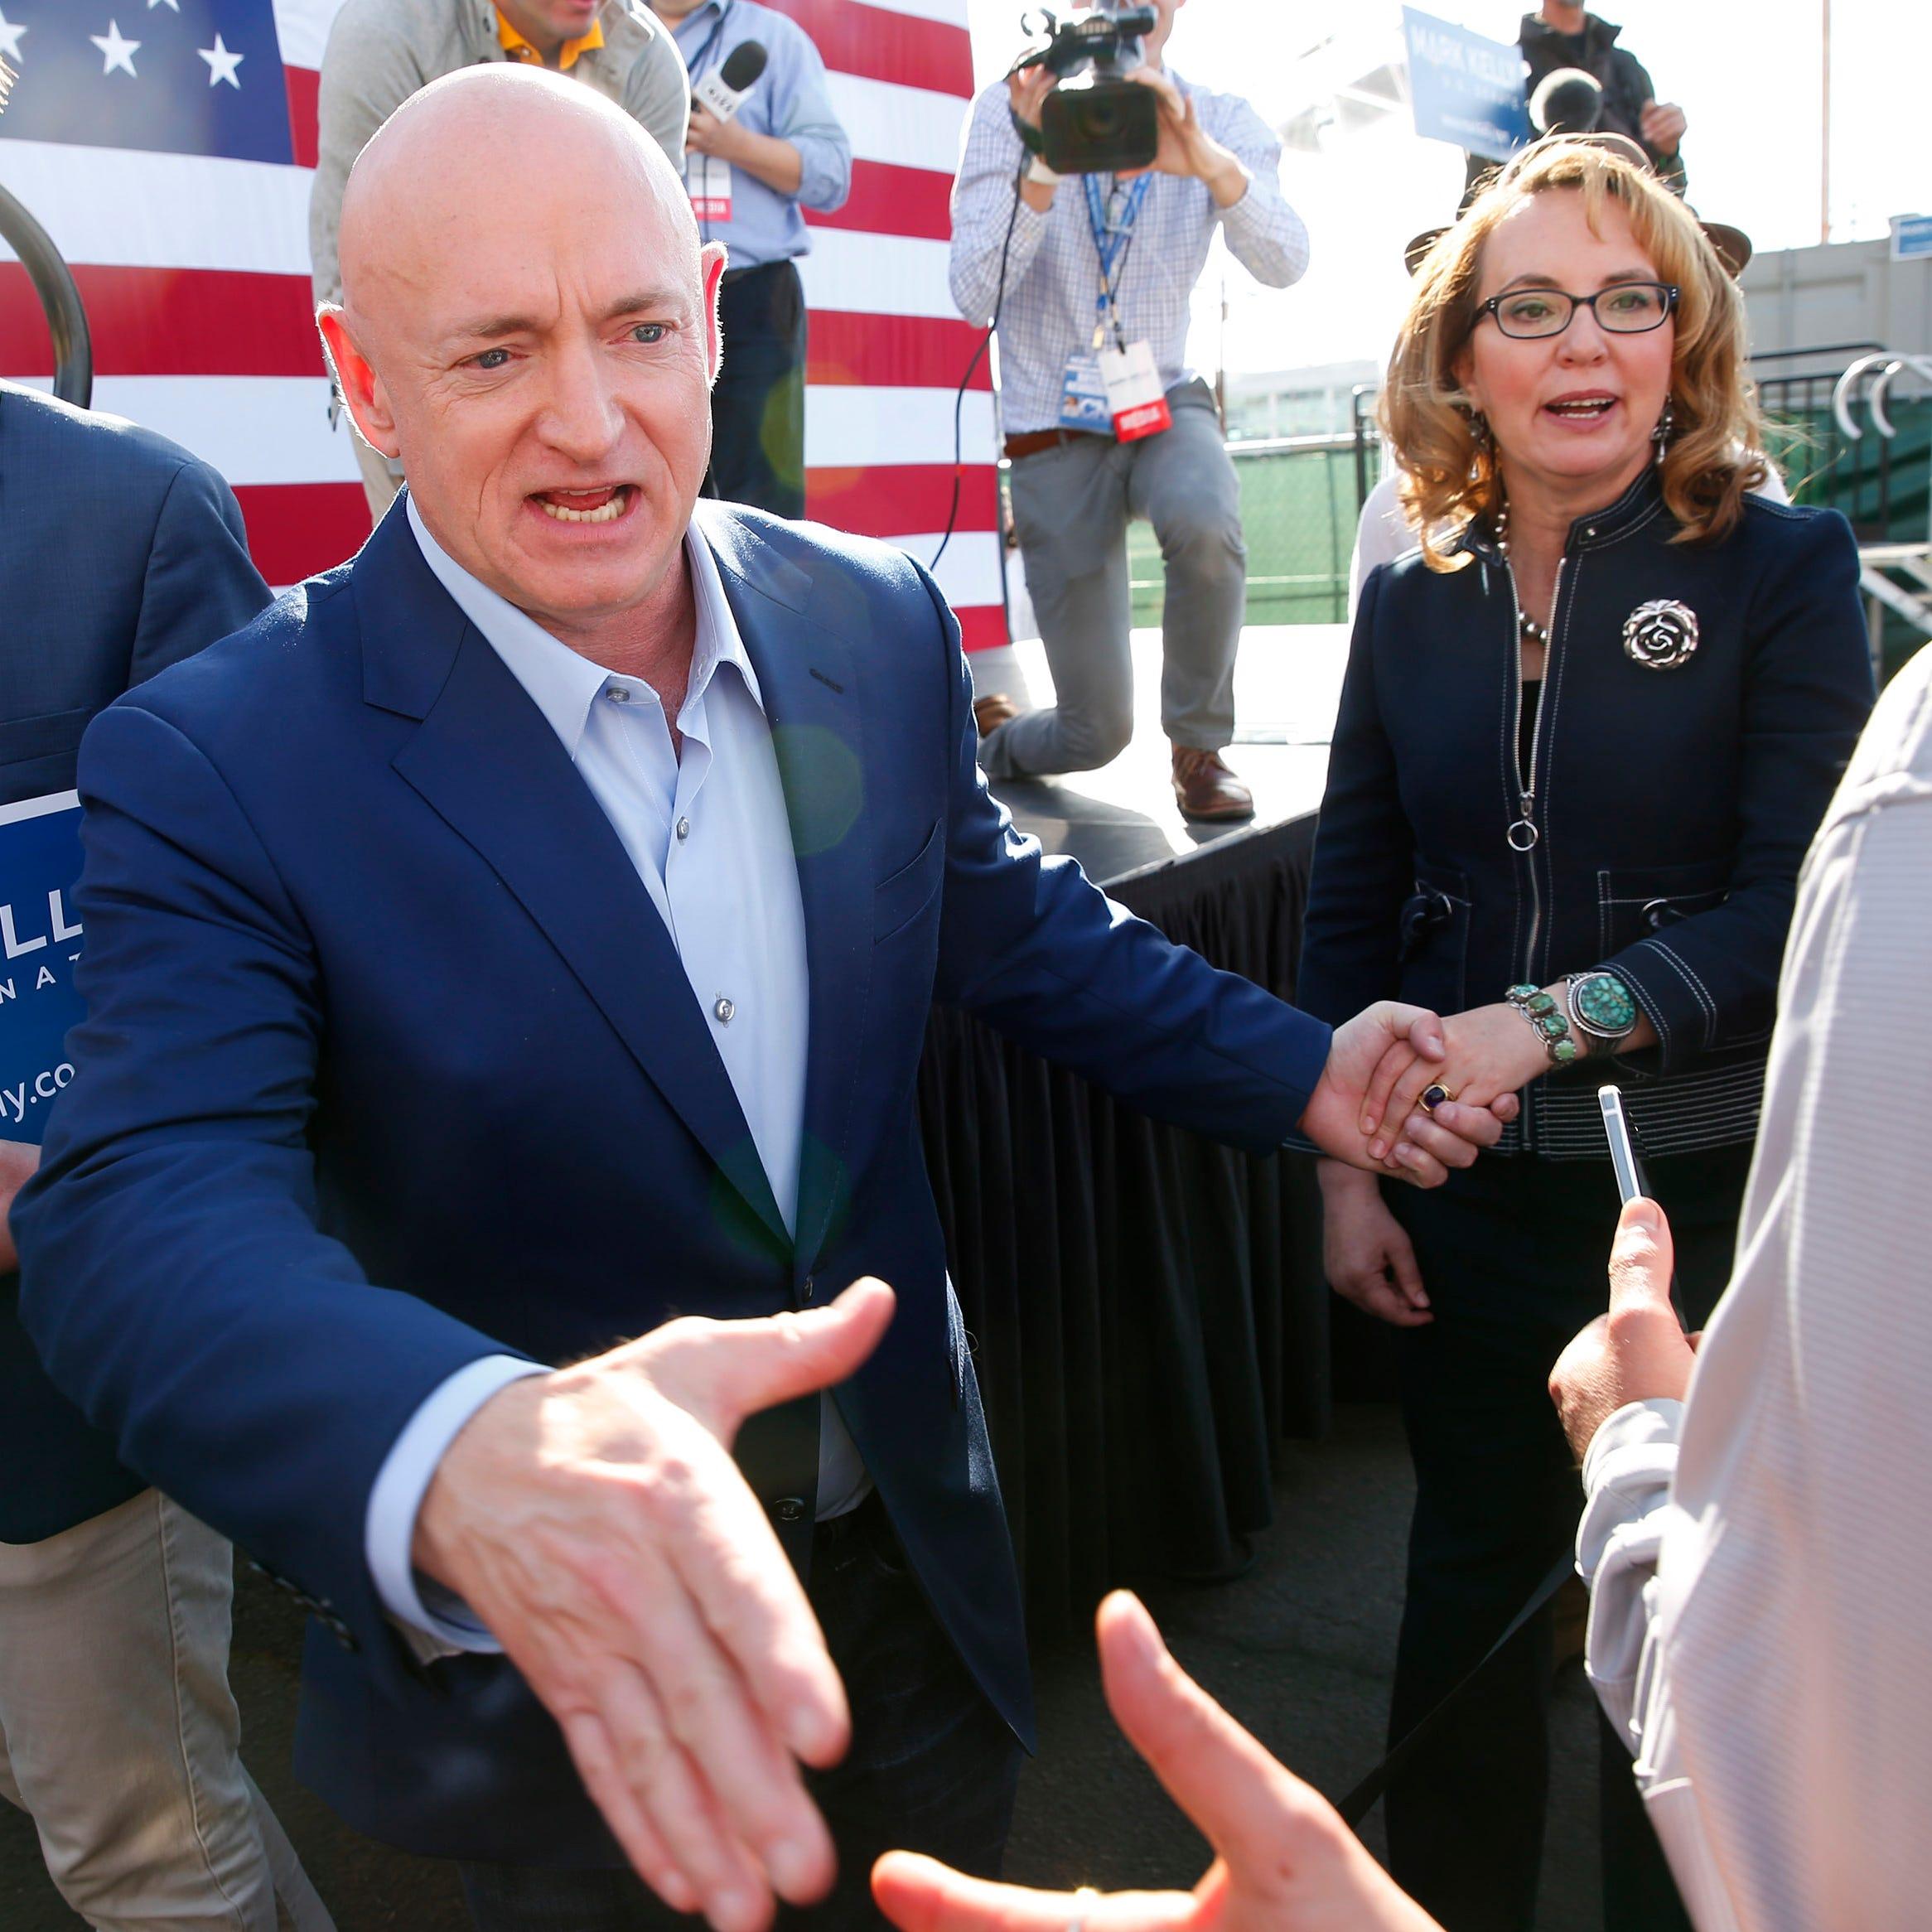 Senate hopeful Mark Kelly raised $4 million in first fundraising haul